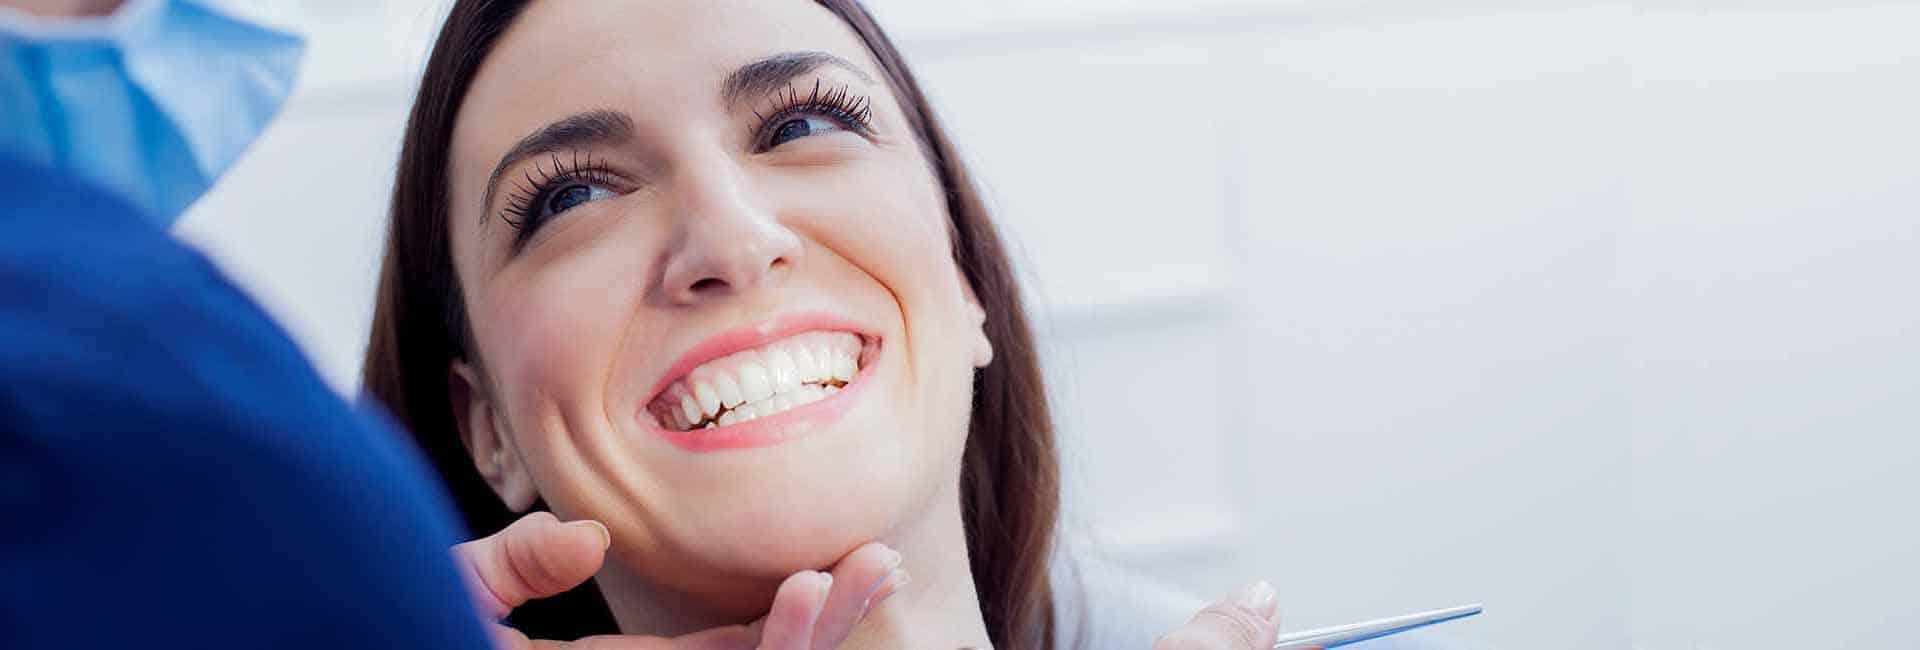 Oral cancer Screening Hero Image